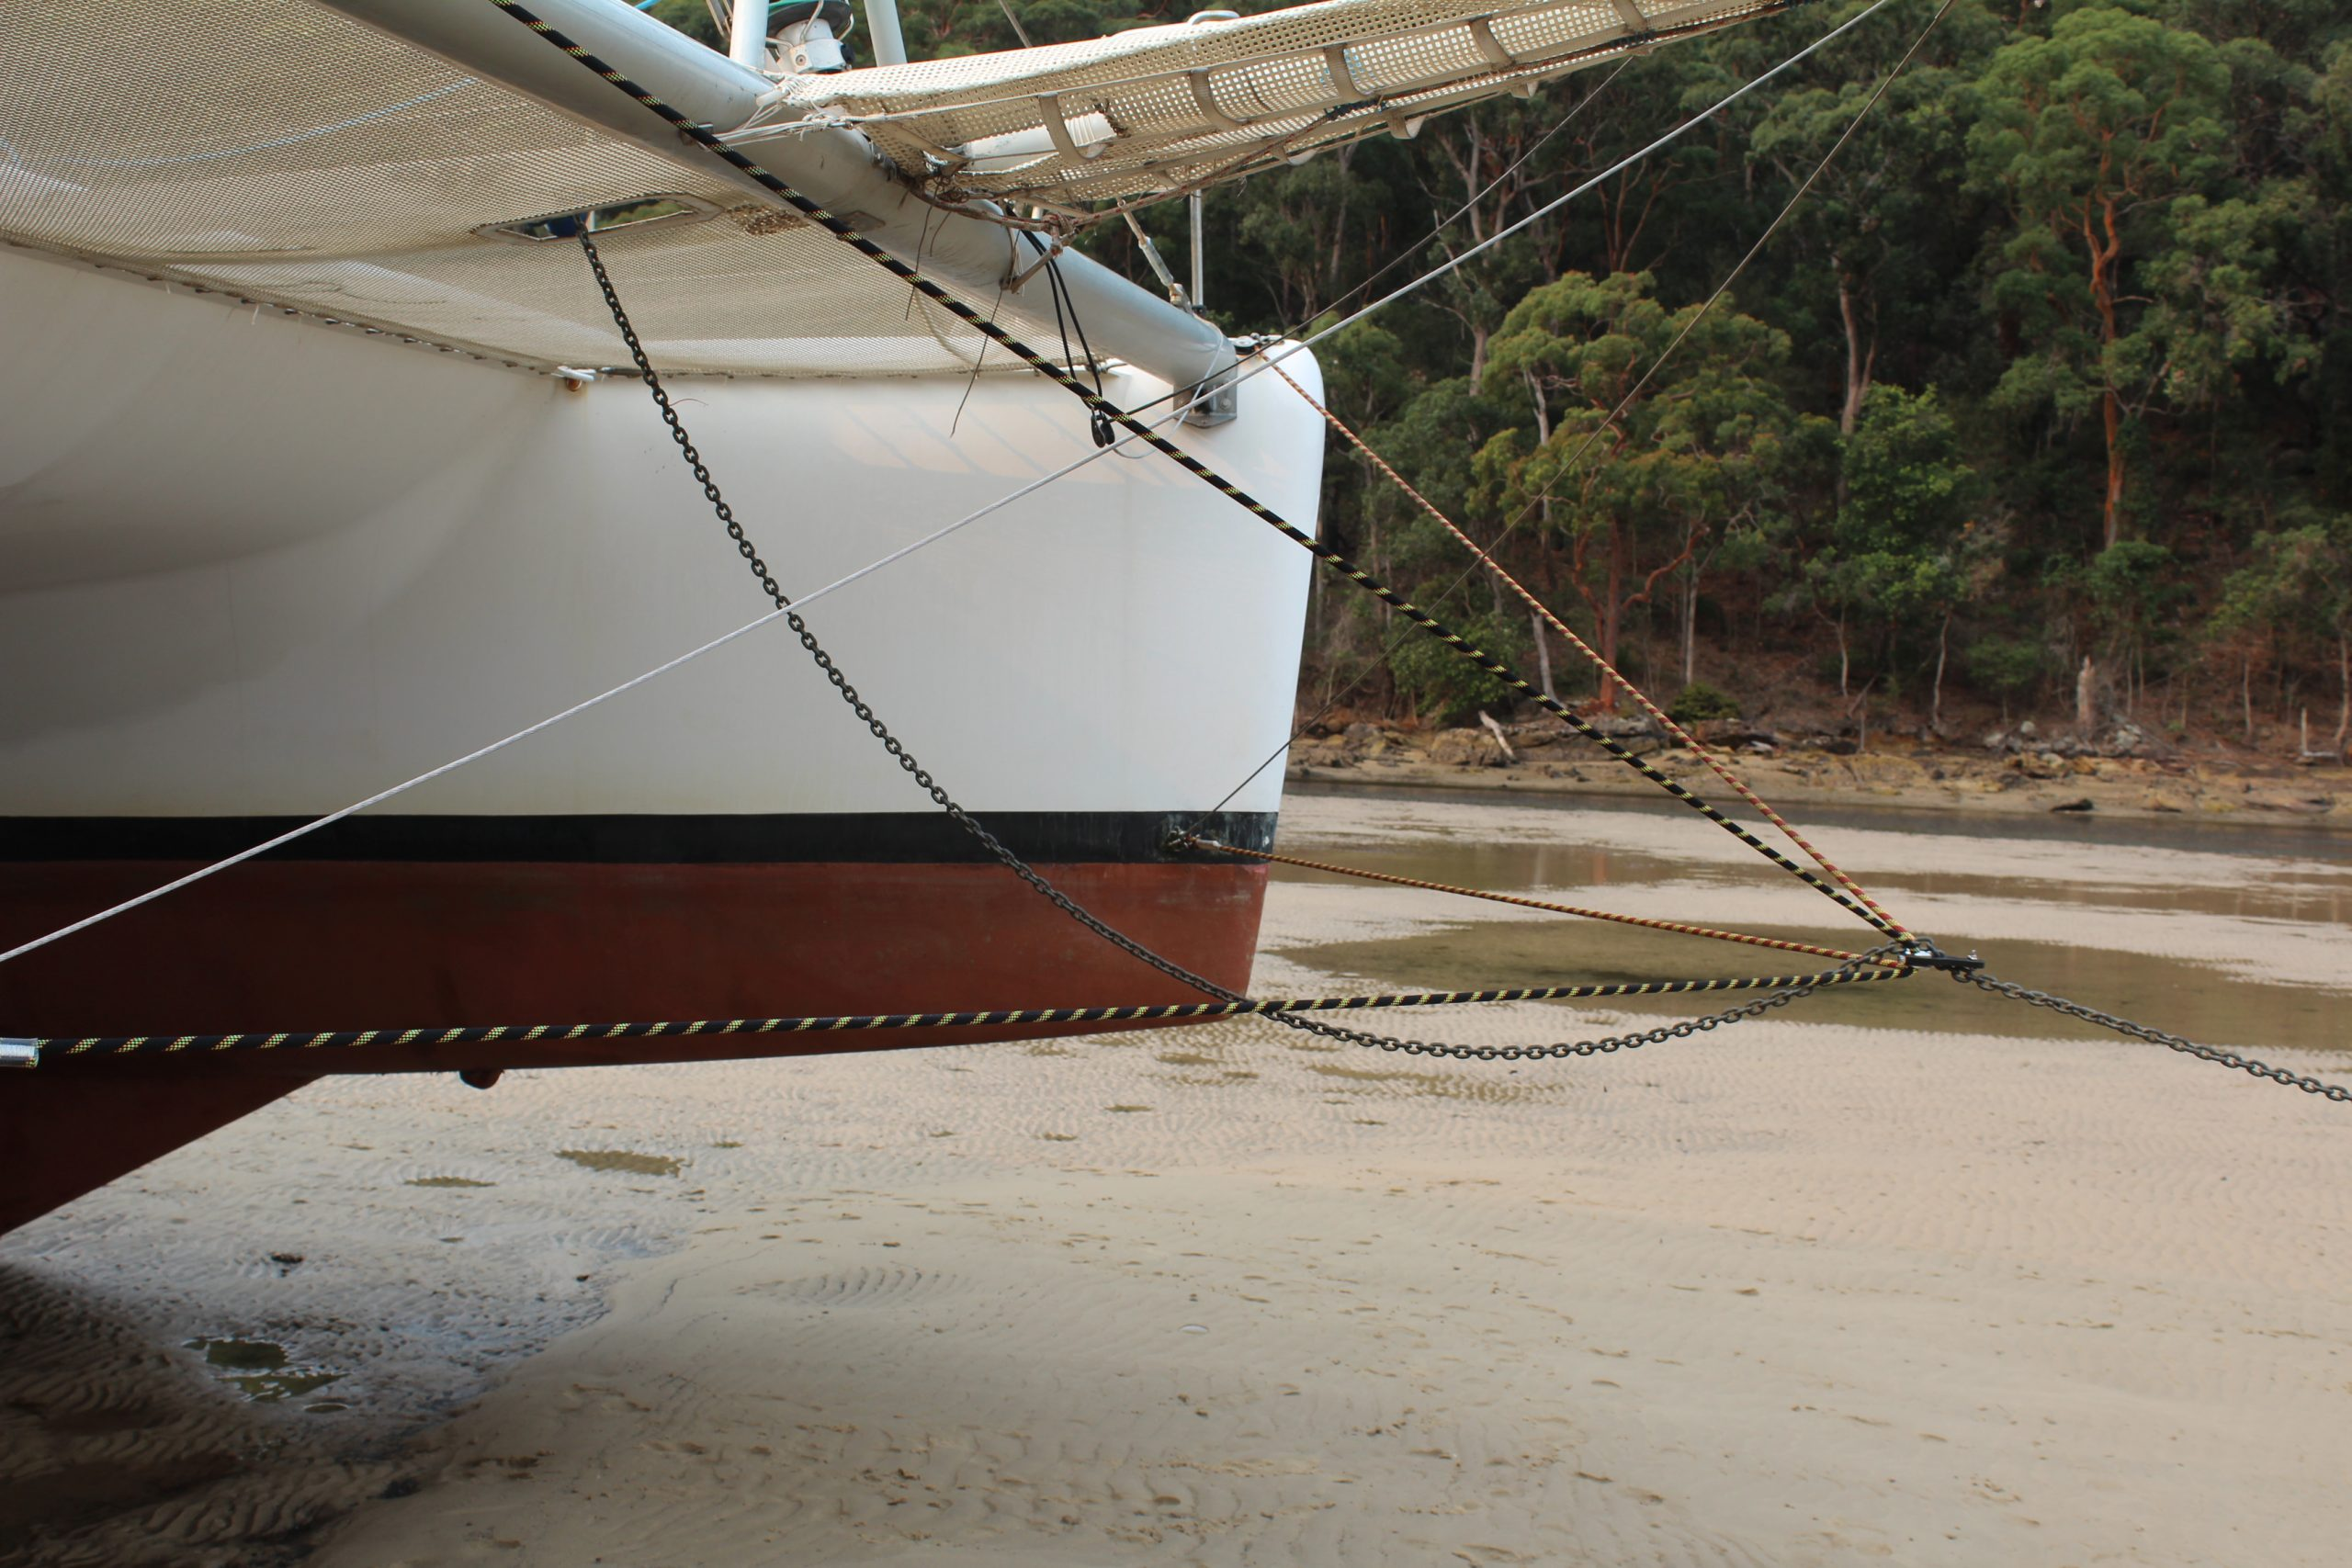 Our bridle now comprises a conventional horizontal 'V' bridle